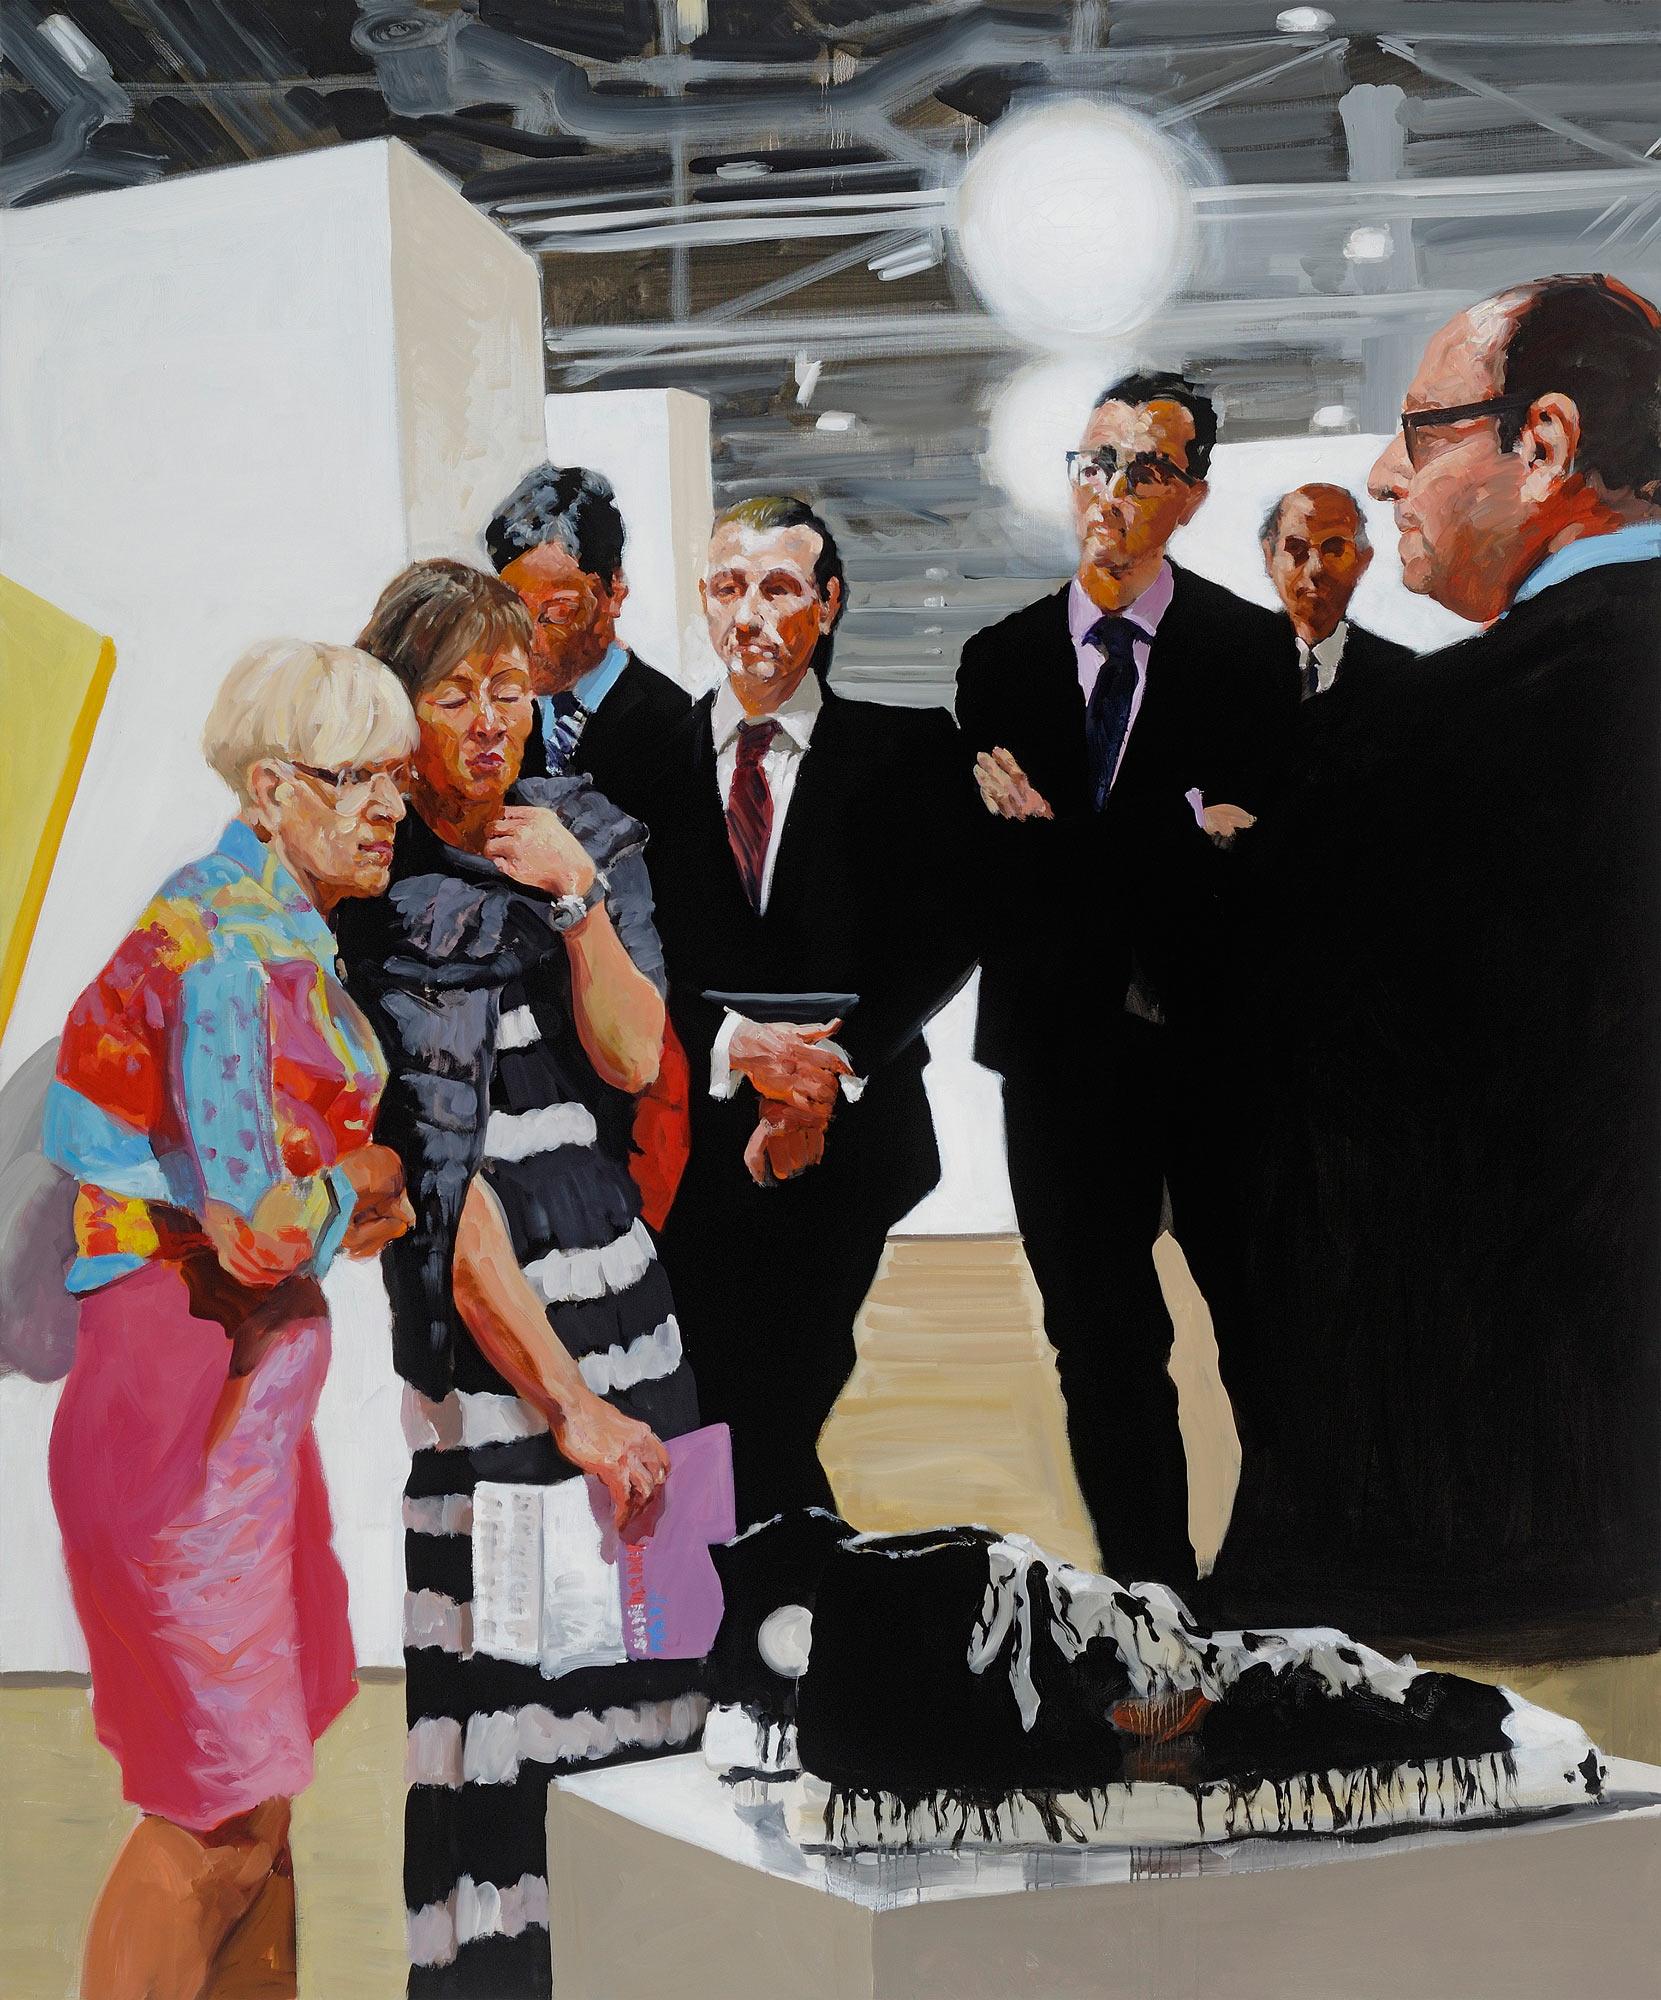 Art Fair: Booth #1 Oldenburg's Sneakers, 2013. Oil on Linen 82 x 68 in. (208 x 284 cm.)